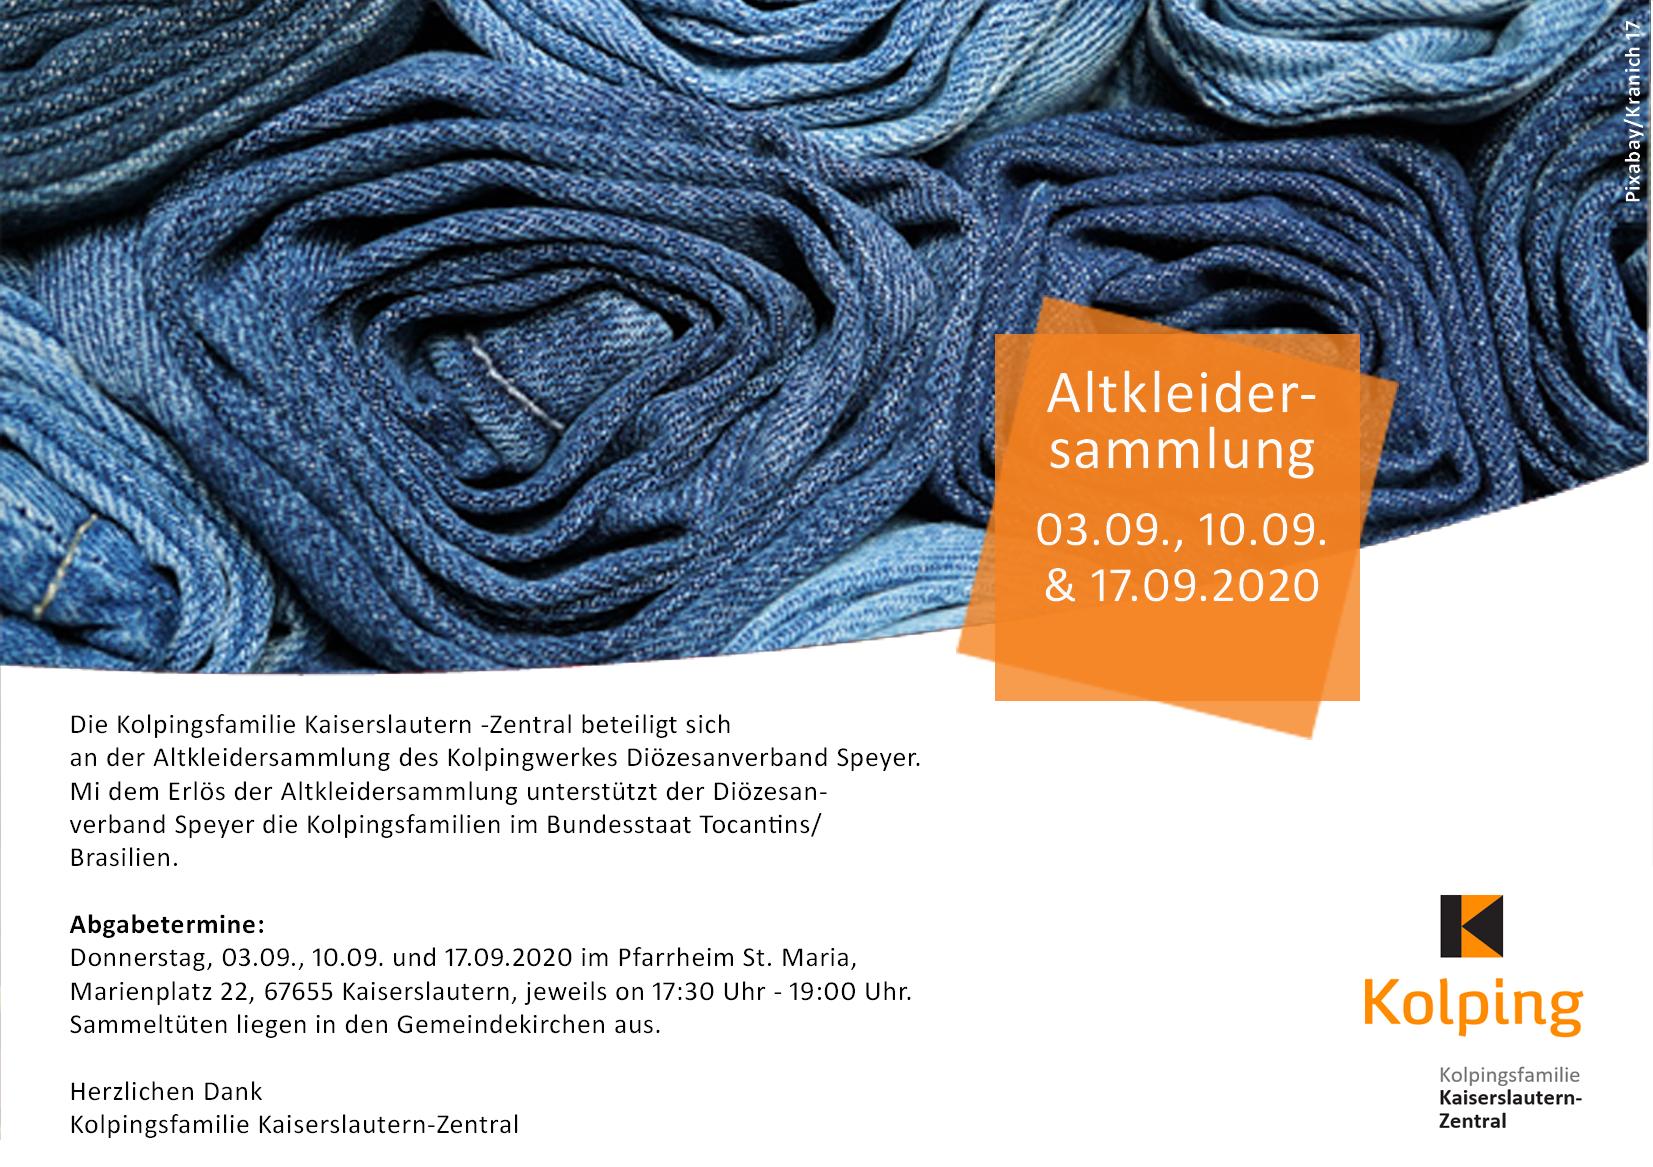 Altkleidersammlung - Kolpingsfamilie Kaiserslautern-Zentral